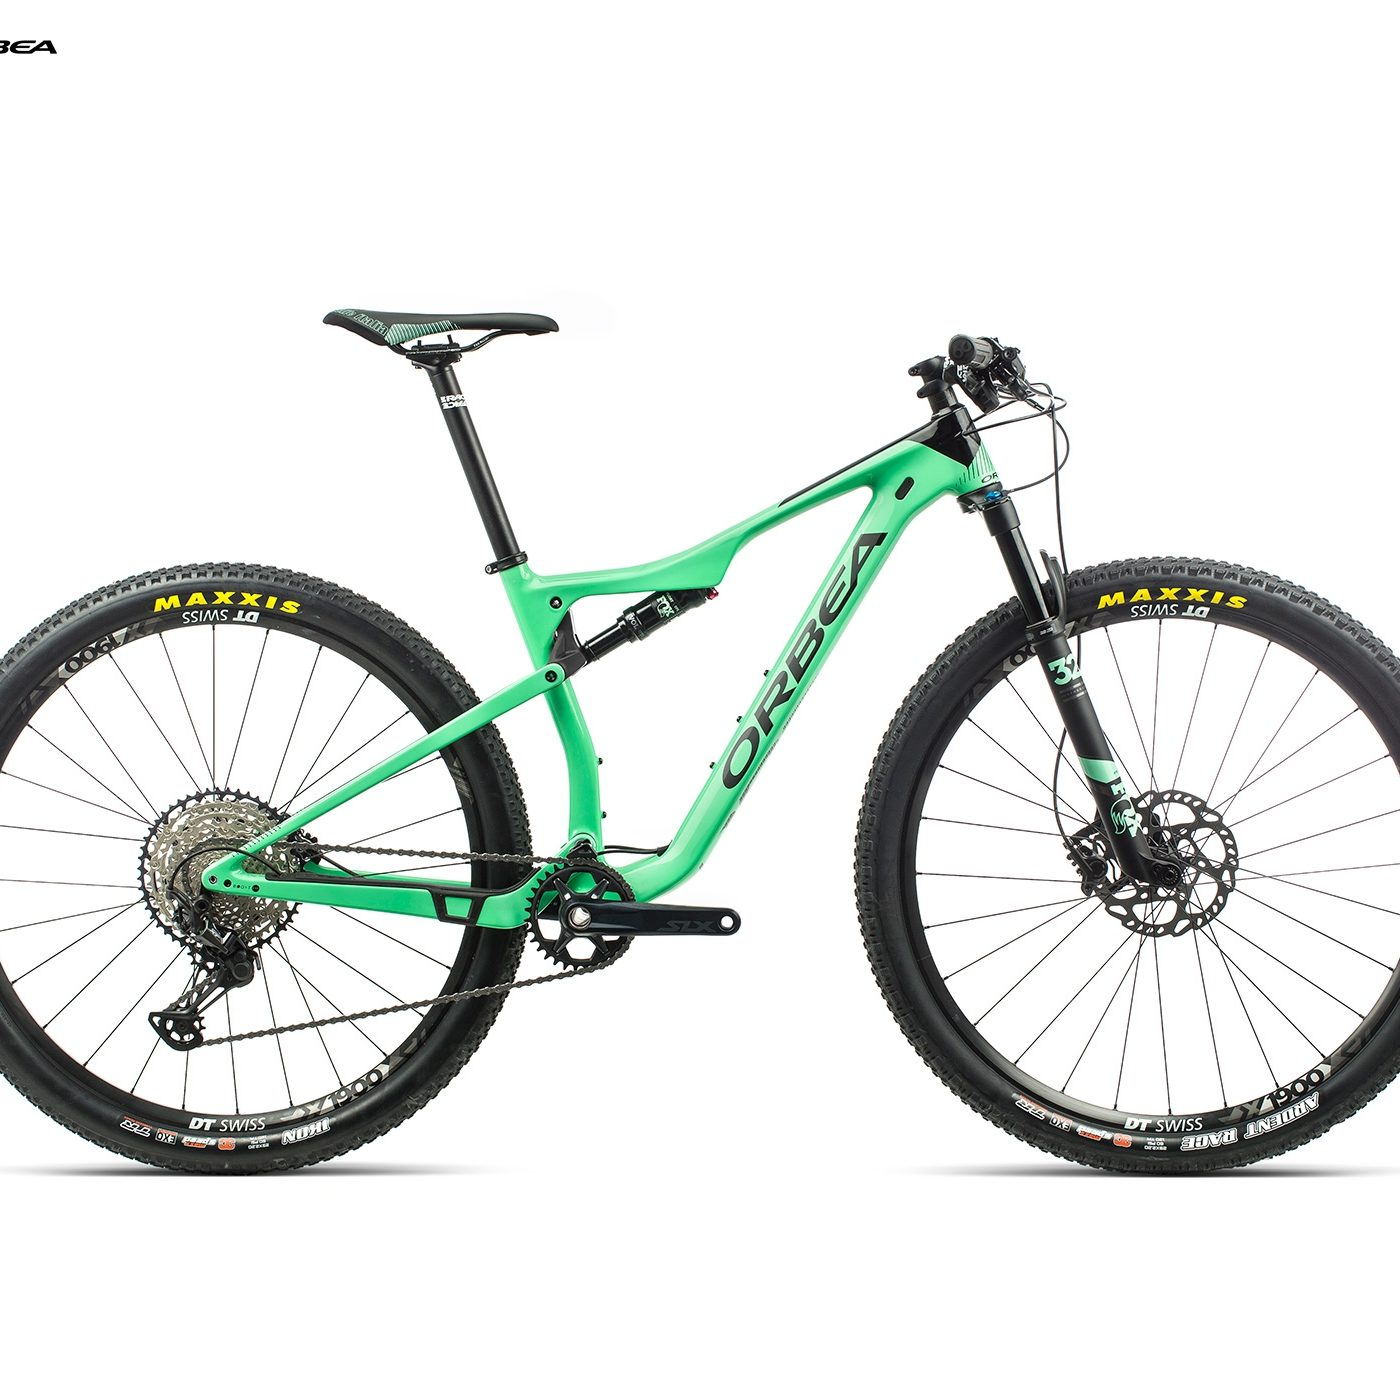 ORBEA OIZ 29 M30 - MUNT / ZWART (GLOSS) @G-Bikes